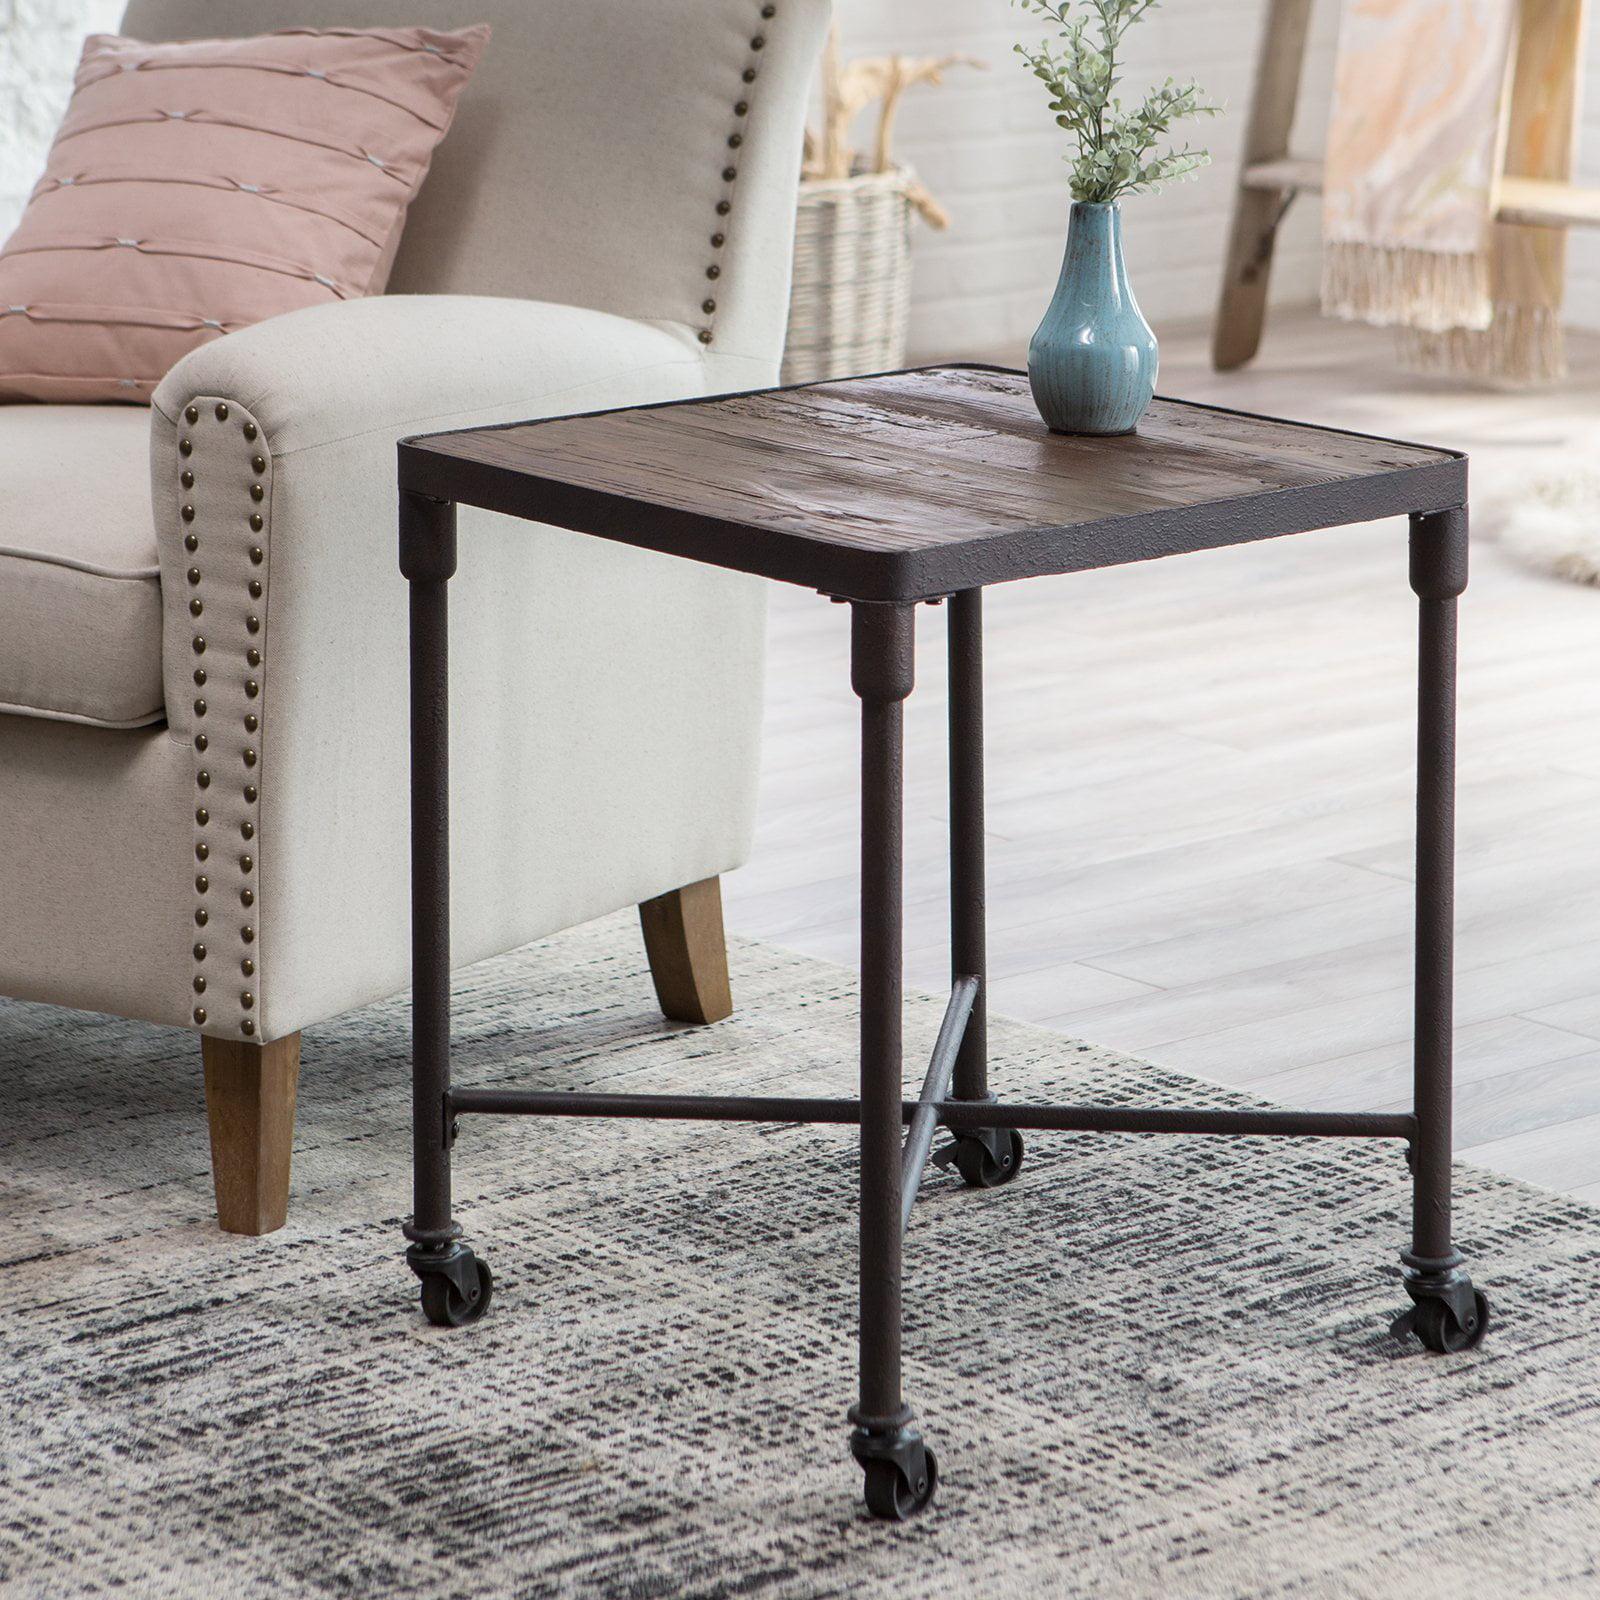 Belham Living Franklin Reclaimed Wood Industrial End Table